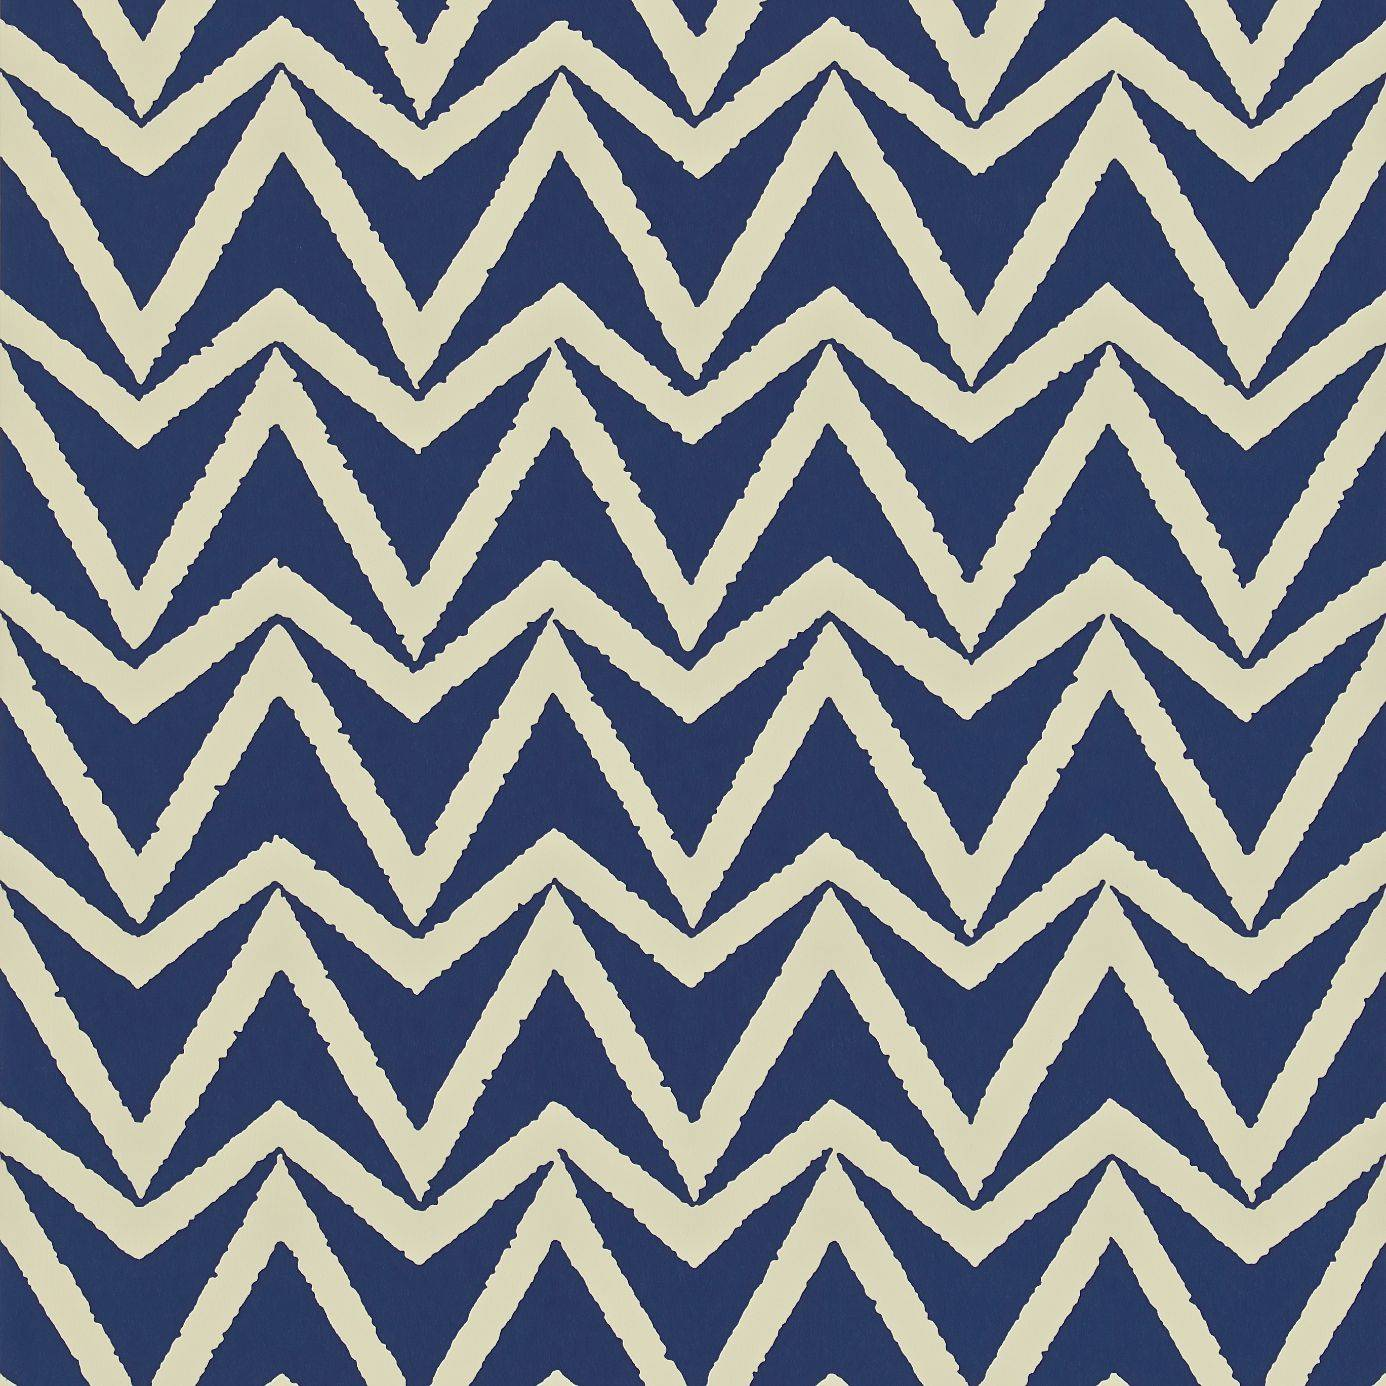 Scion Wabi Sabi Wallpapers Dhurrie Wallpaper - Indigo - 110448. Loading zoom